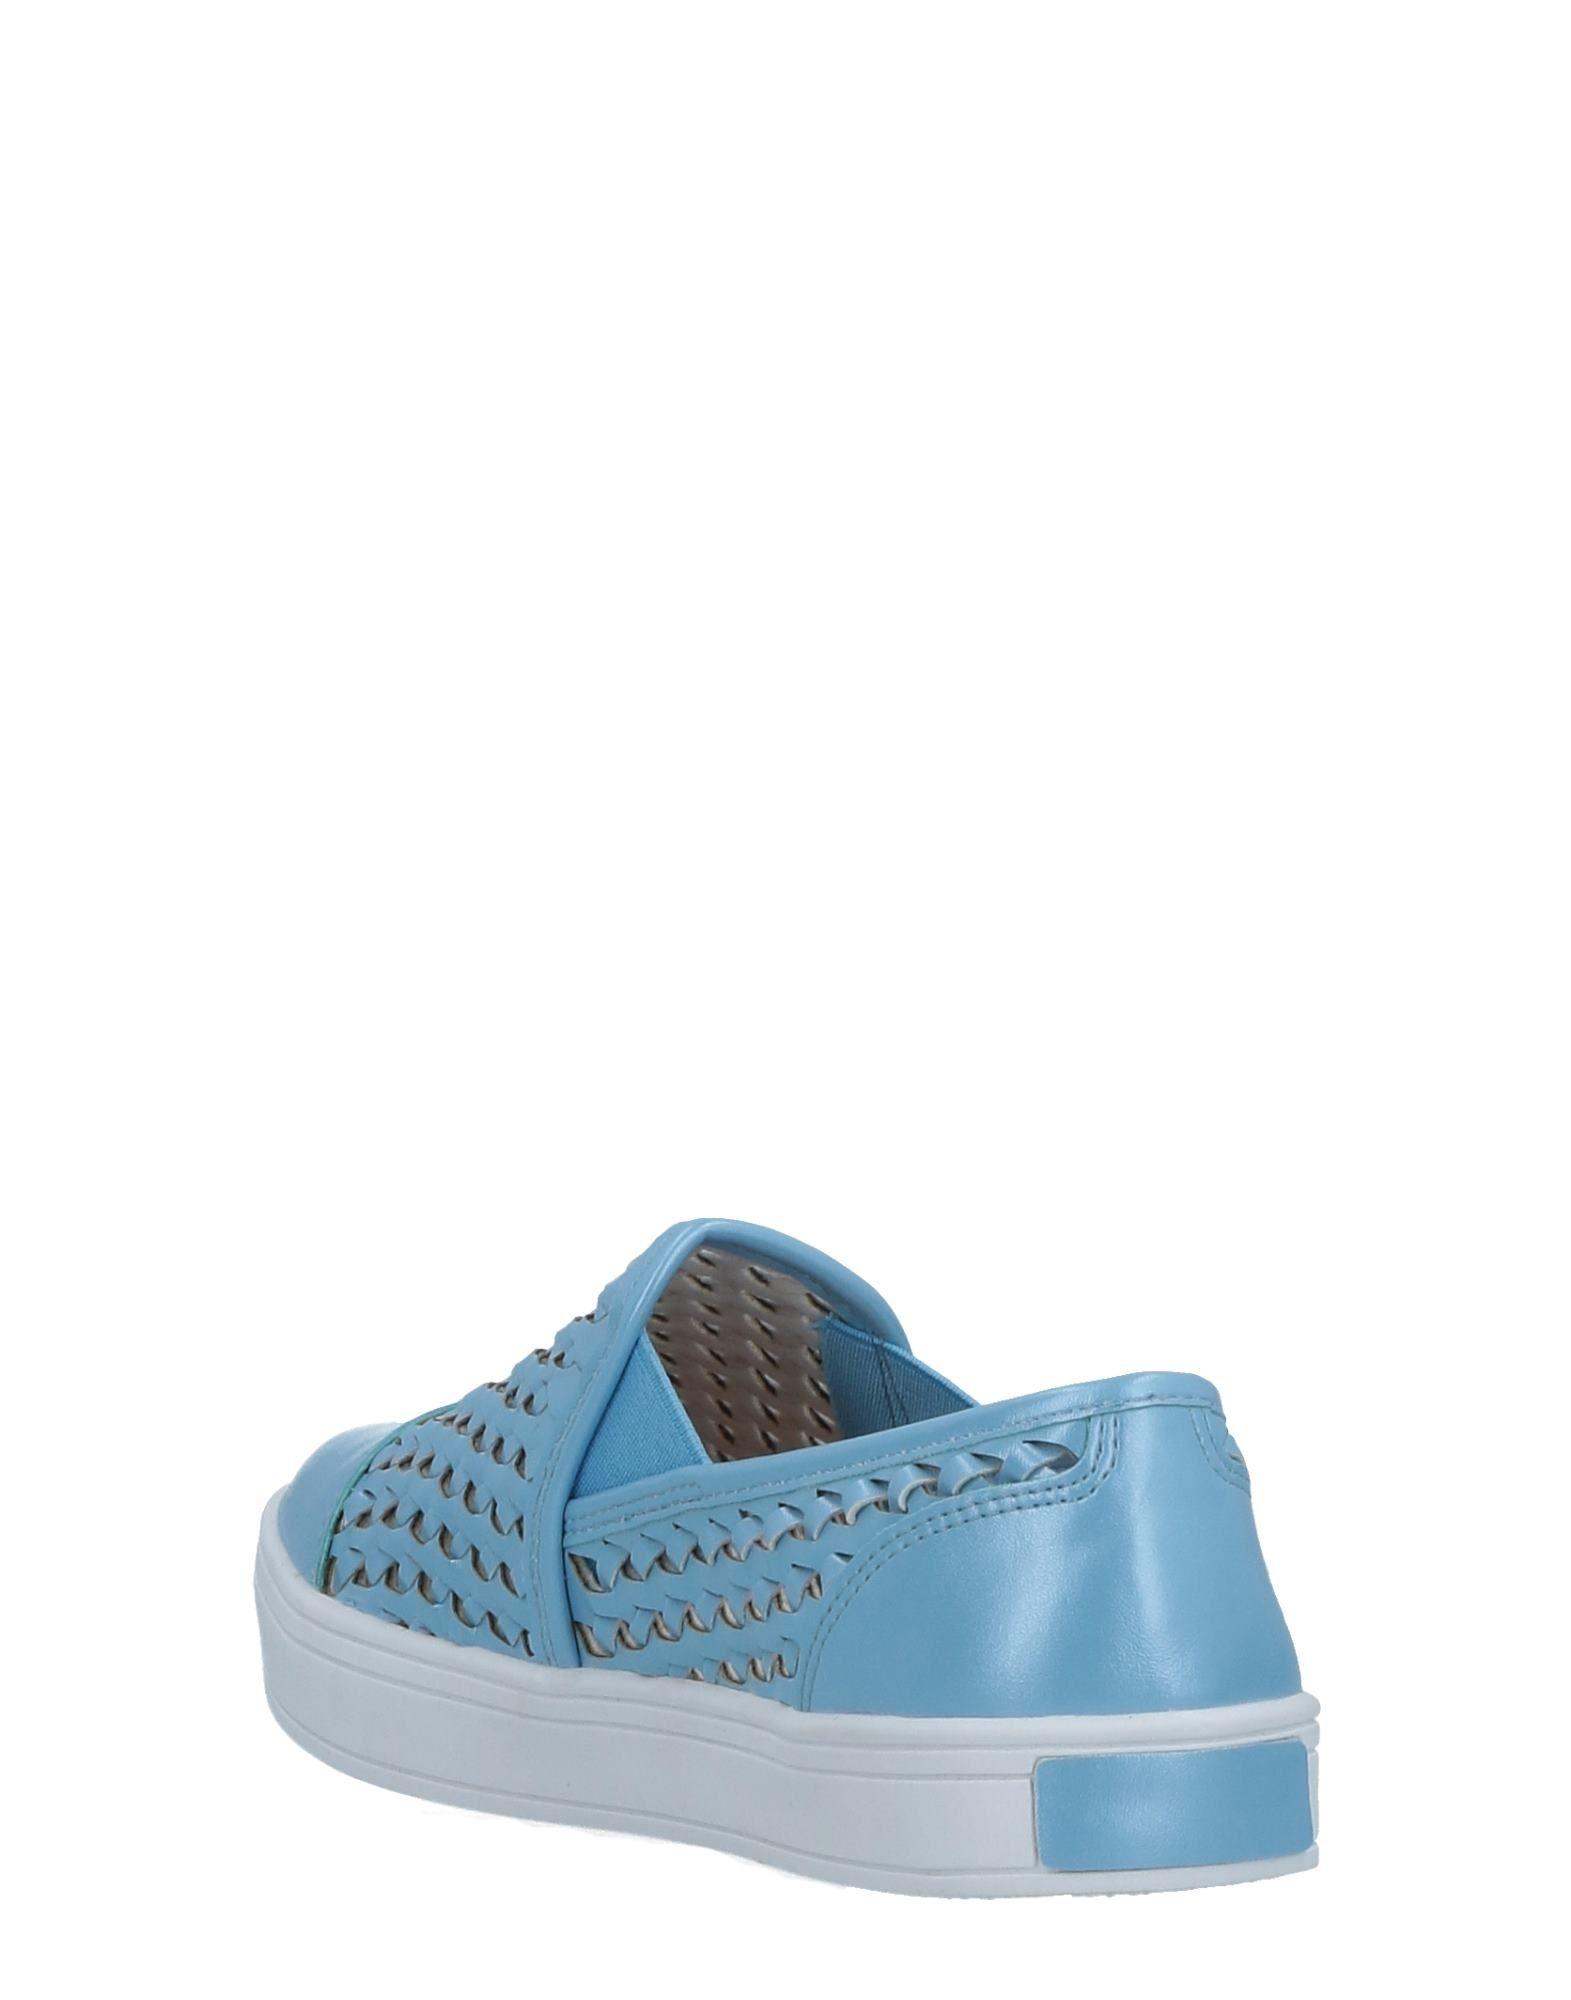 Tua By Braccialini Sneakers Damen  11514591DA Neue Schuhe